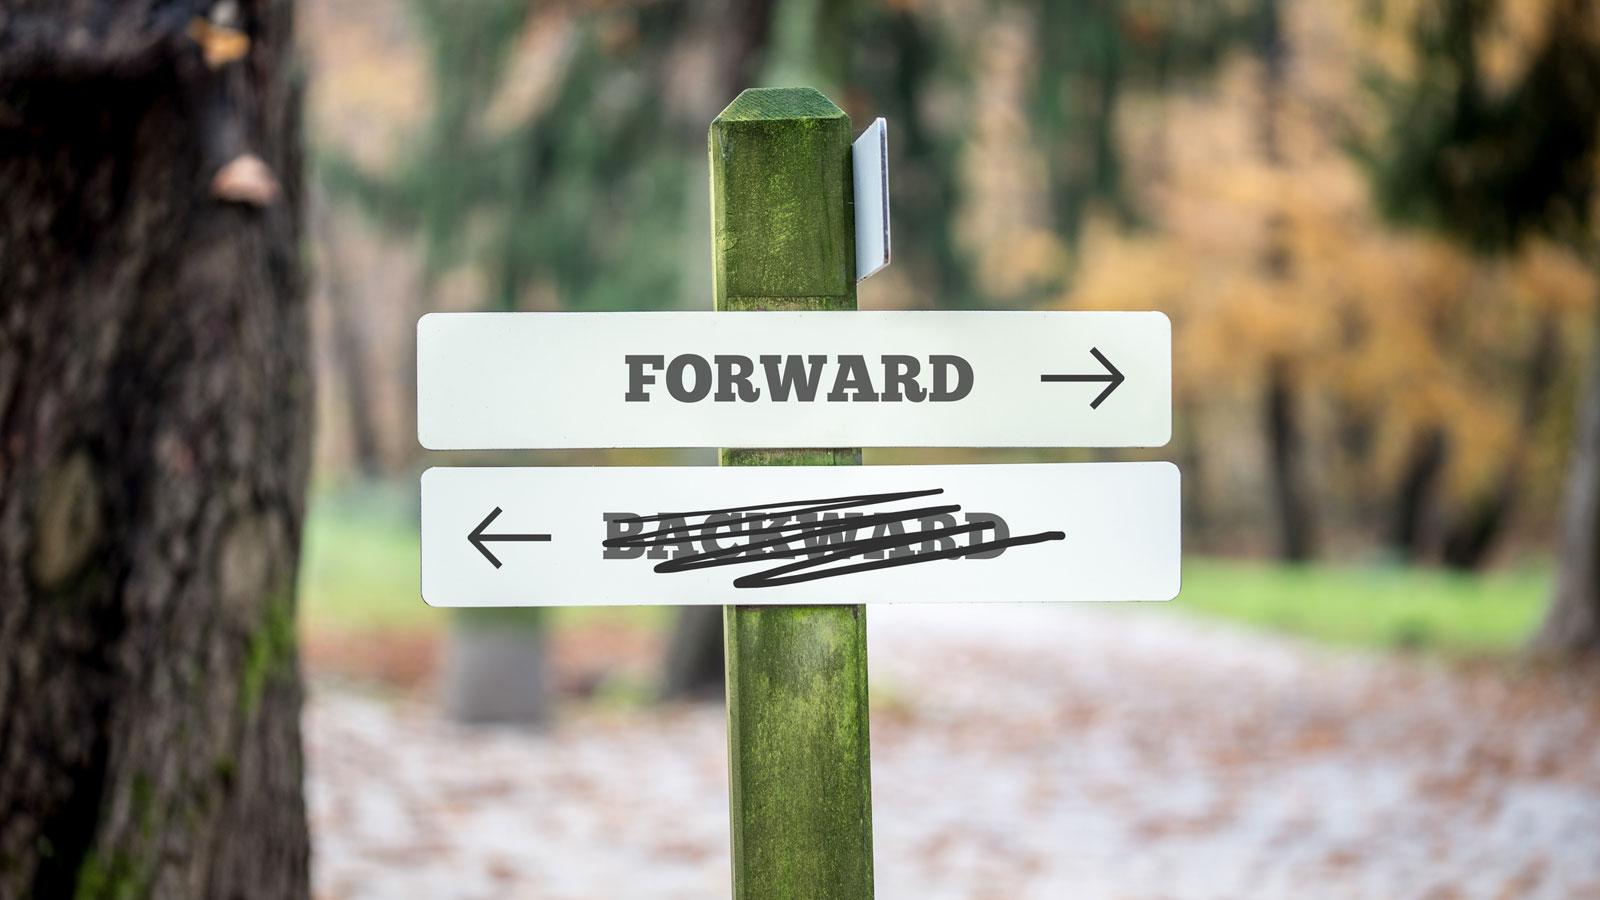 Backward forward sign